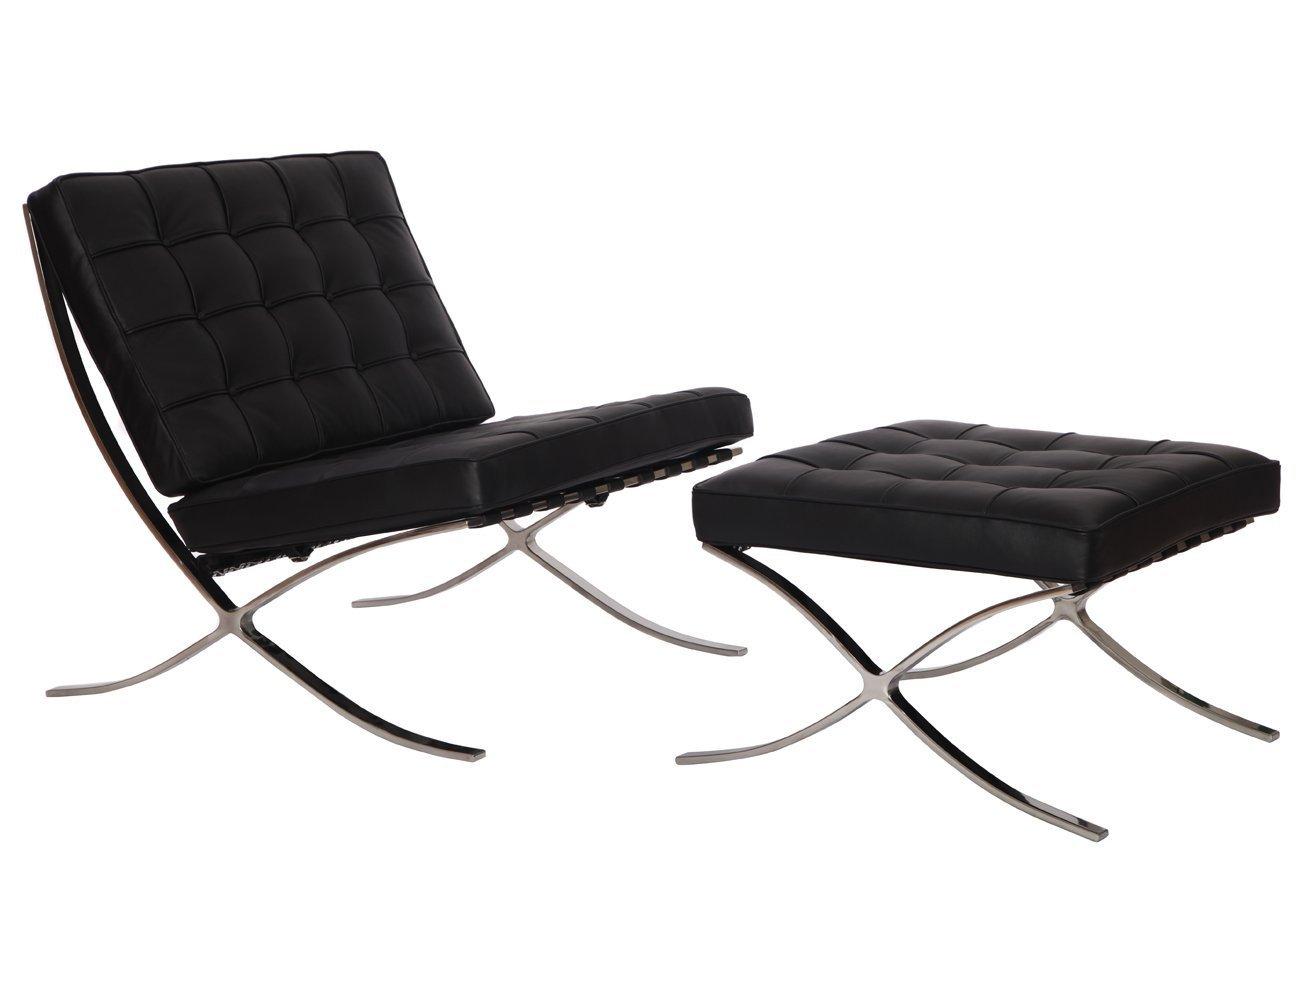 Amazon com emodern furniture emod modern pavilion barcelona chair italian leather black with ottoman kitchen dining